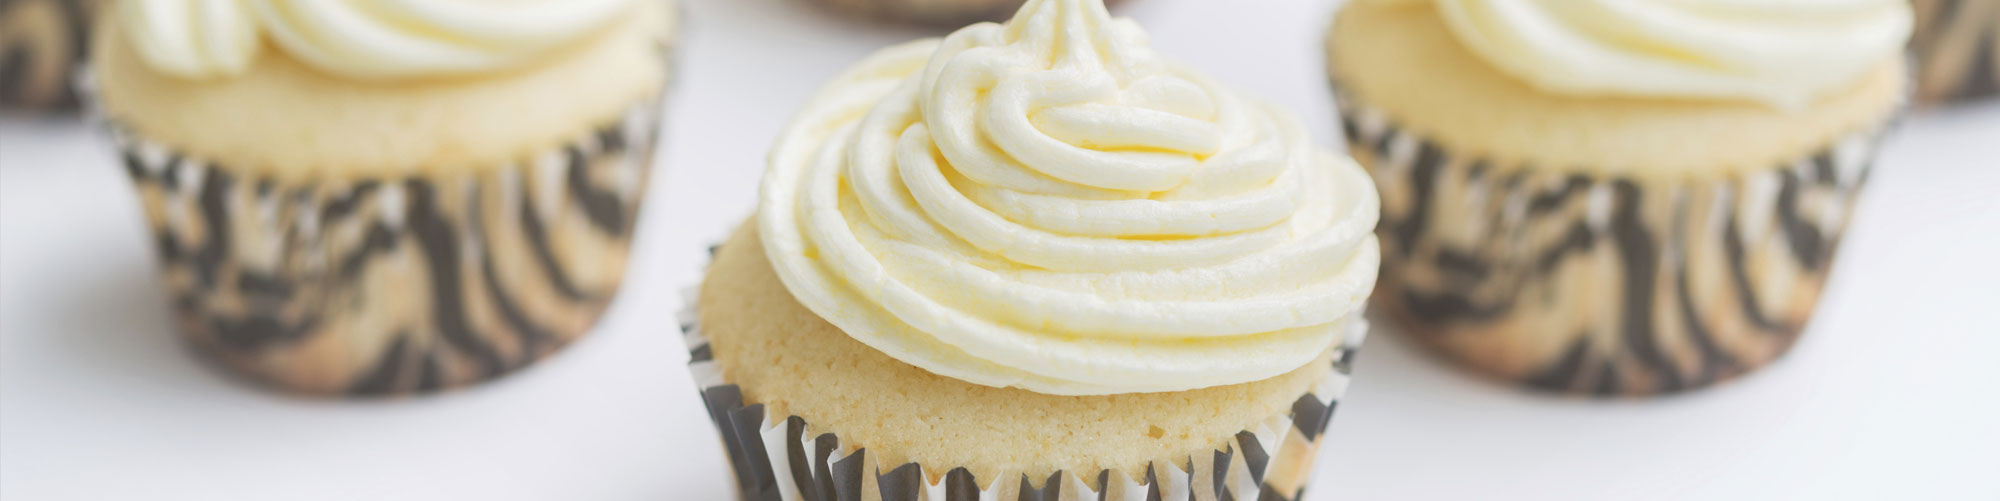 CupcakeTestimonialWeb